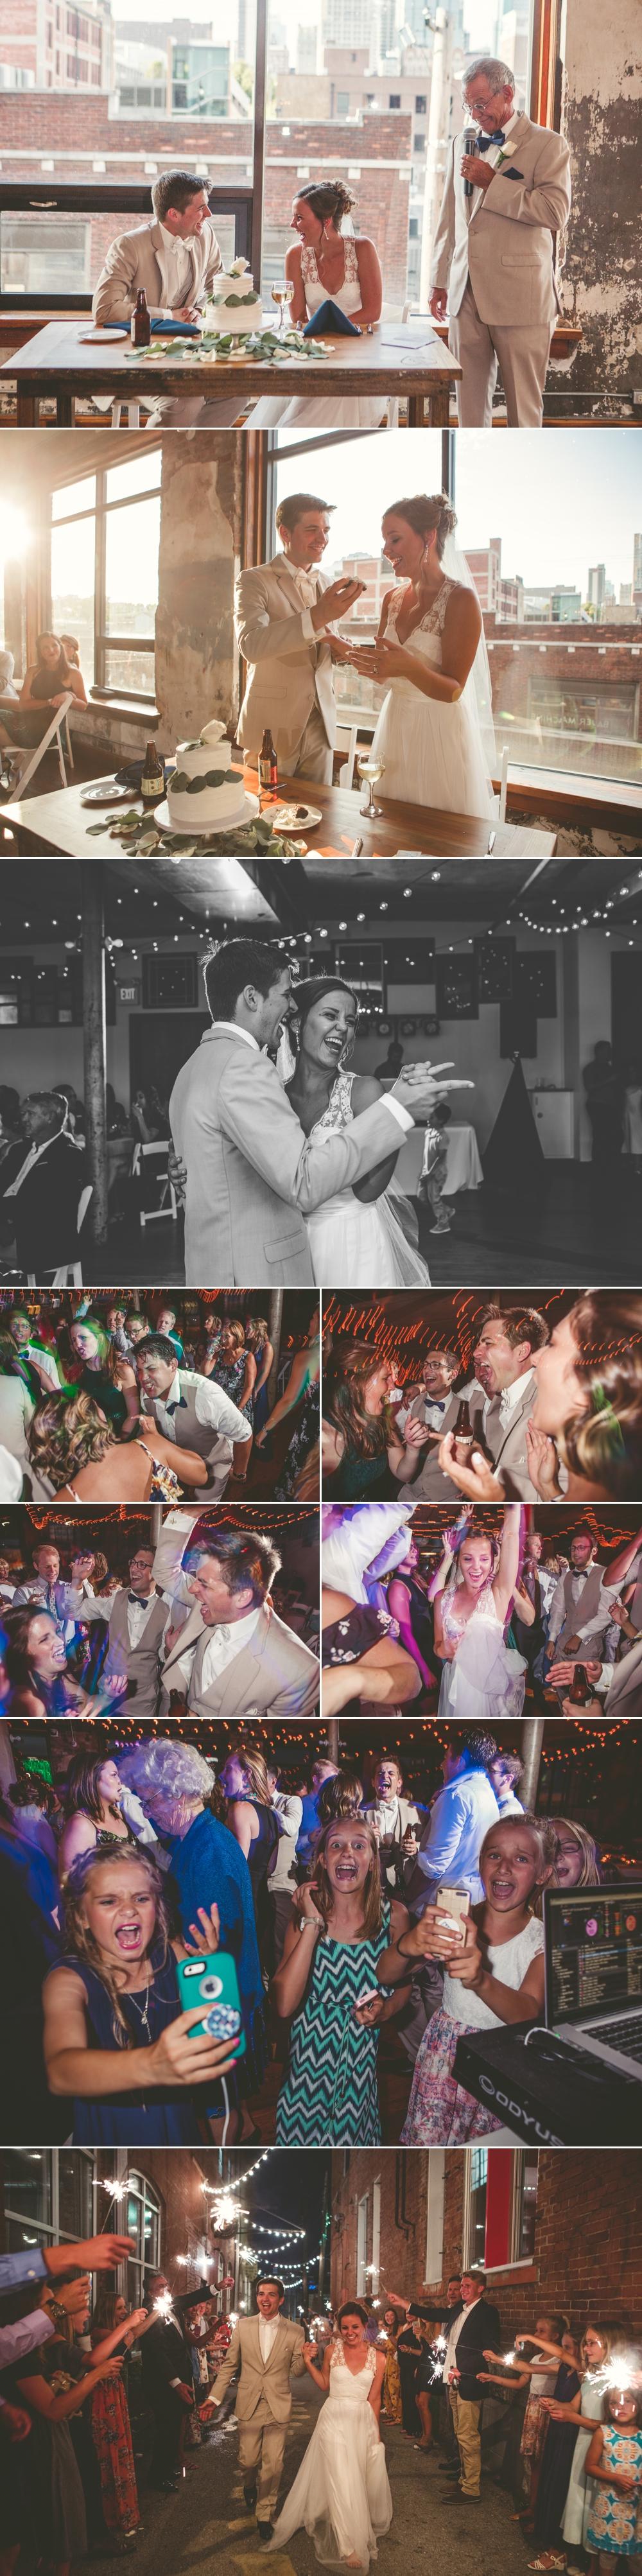 jason_domingues_photography_best_kansas_city_photographer_kc_weddings_bauer_0005.JPG